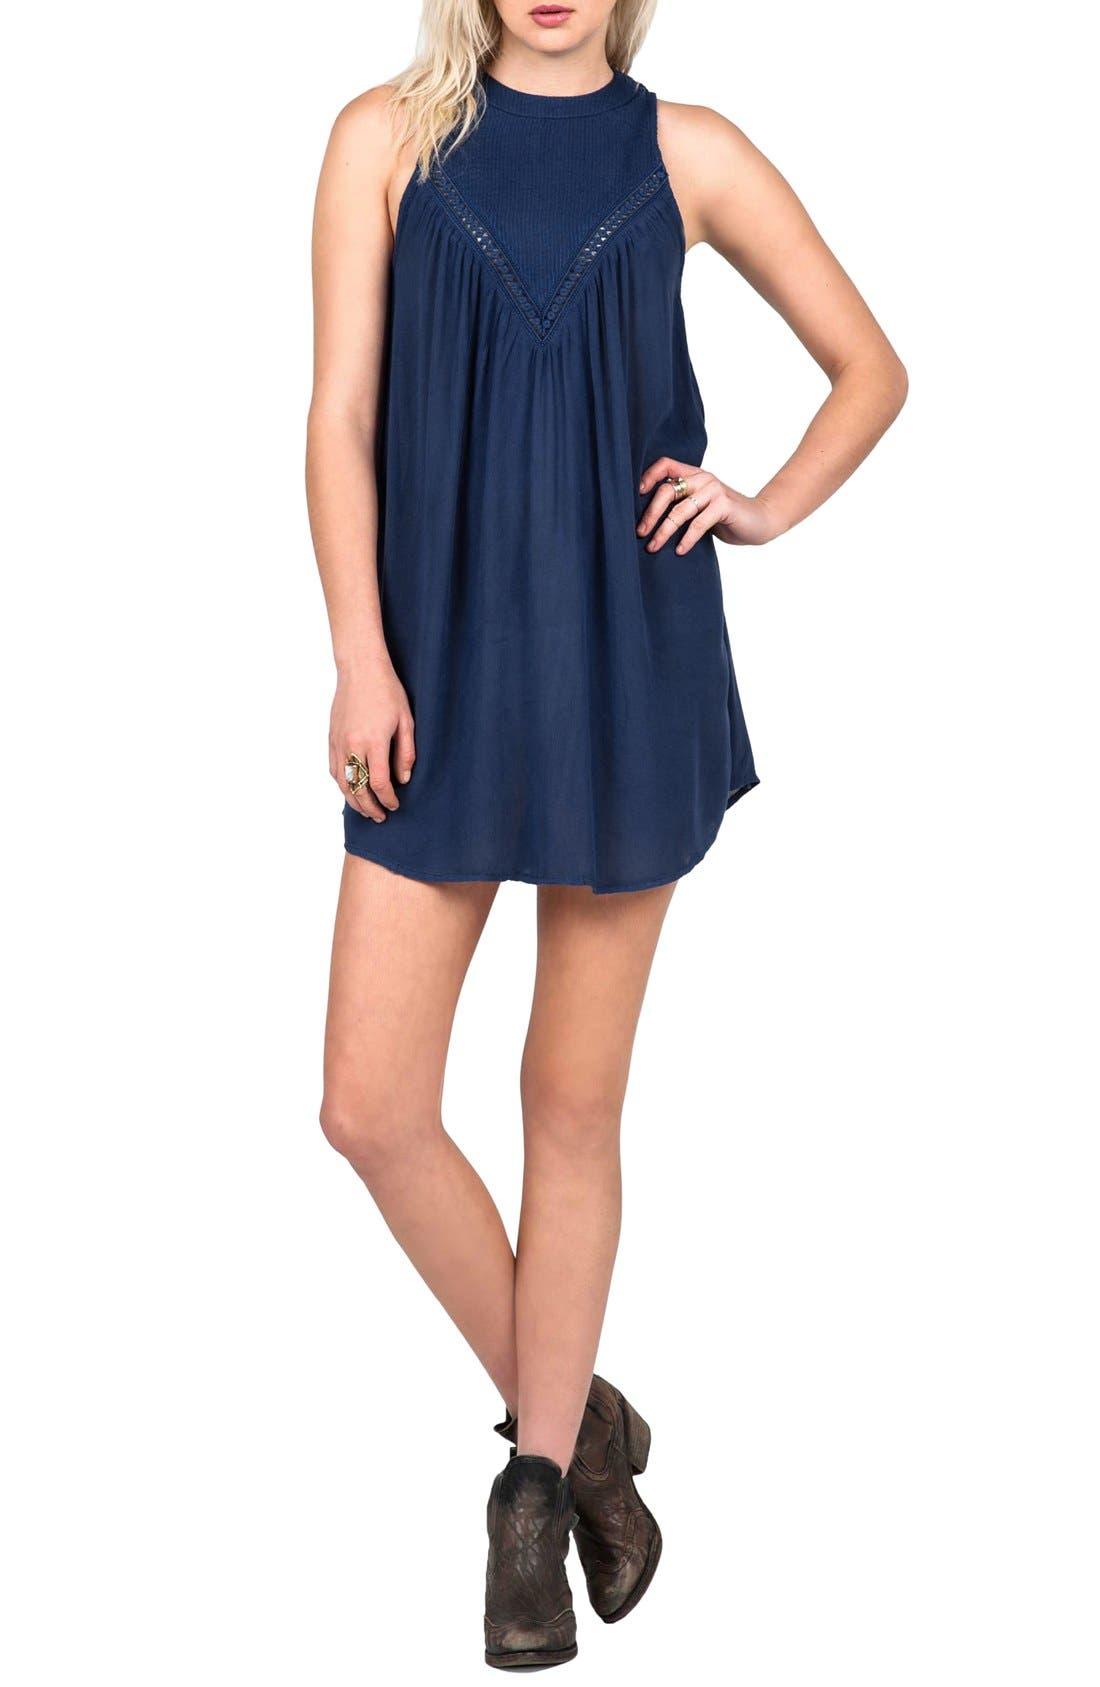 Main Image - Volcom 'Peaceazy' Tank Dress